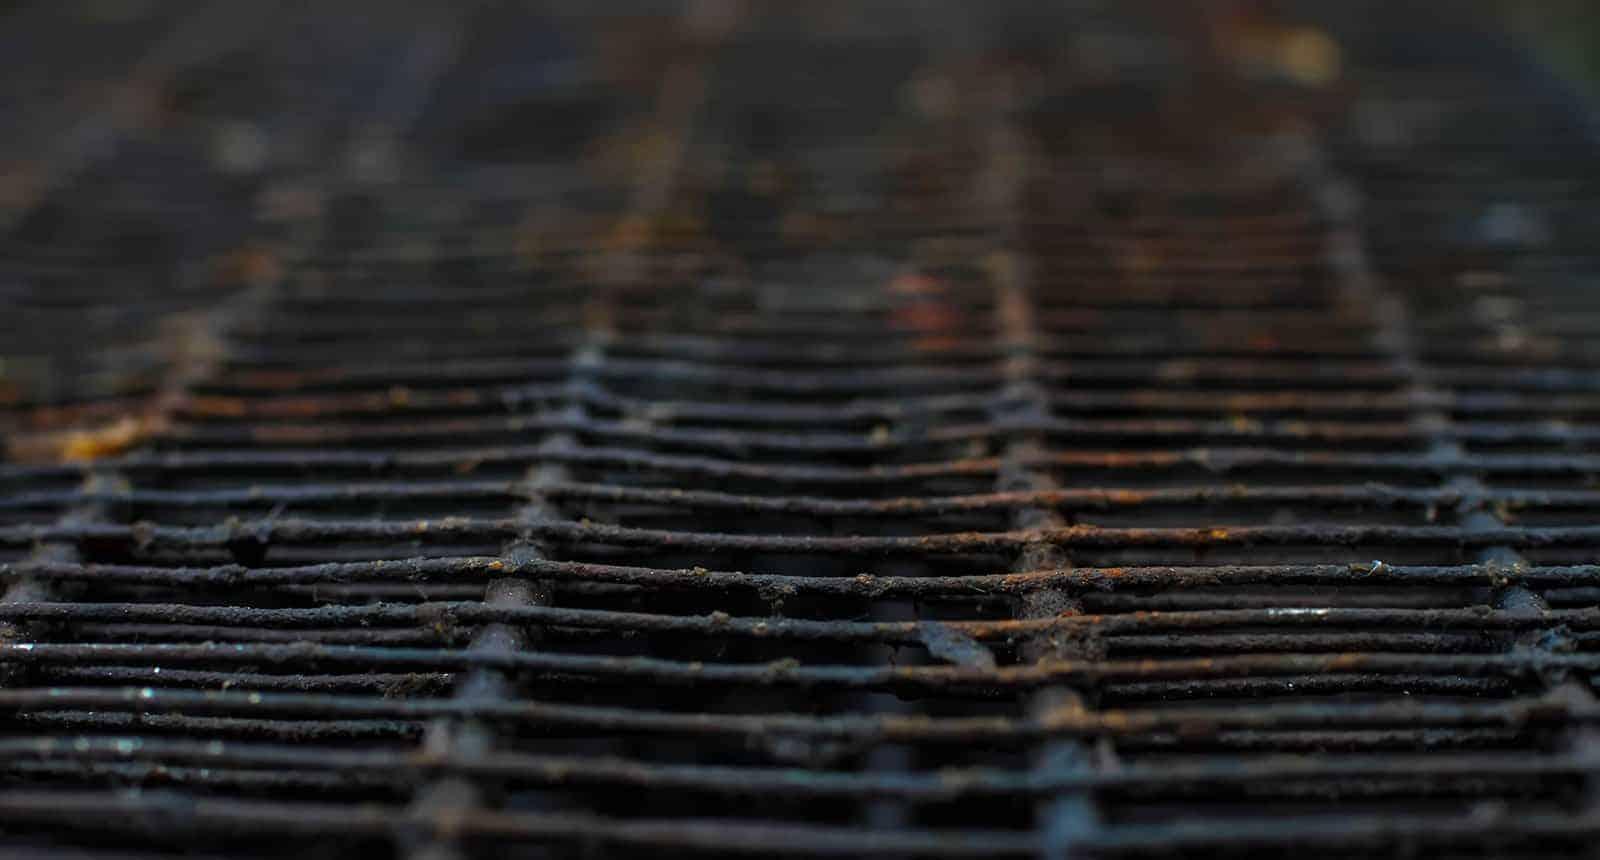 Burnt Grill